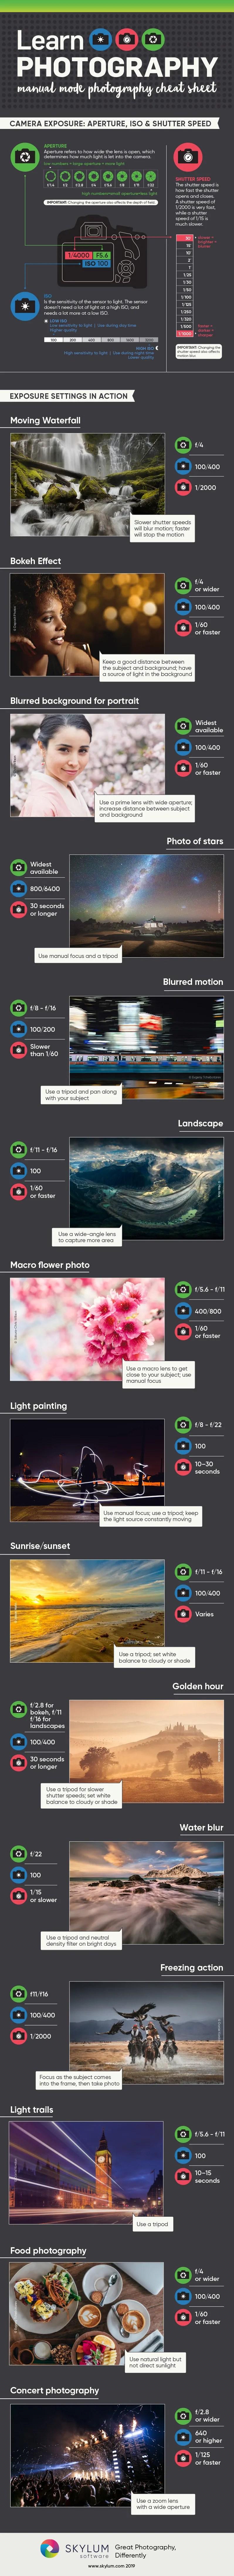 Digital camera buying guide, 5 Best Digital Cameras to buy 1